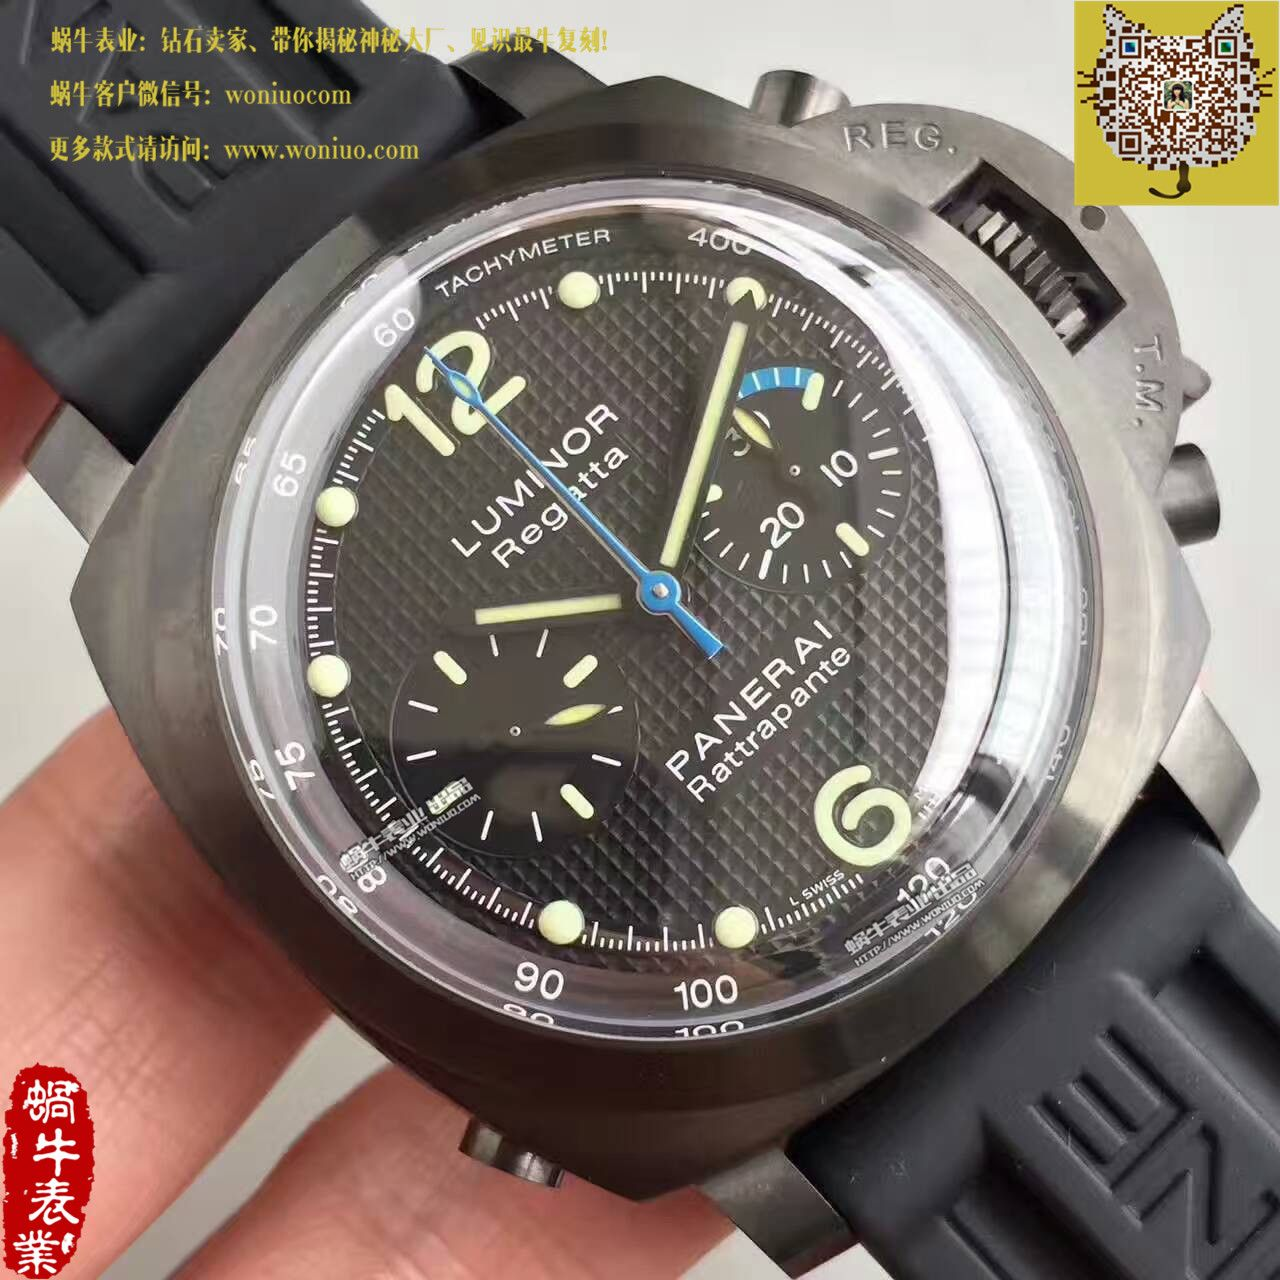 【XF厂一比一超A精仿手表】沛纳海限量珍藏款系列PAM 00332史泰龙敢死队同款腕表 / PA088